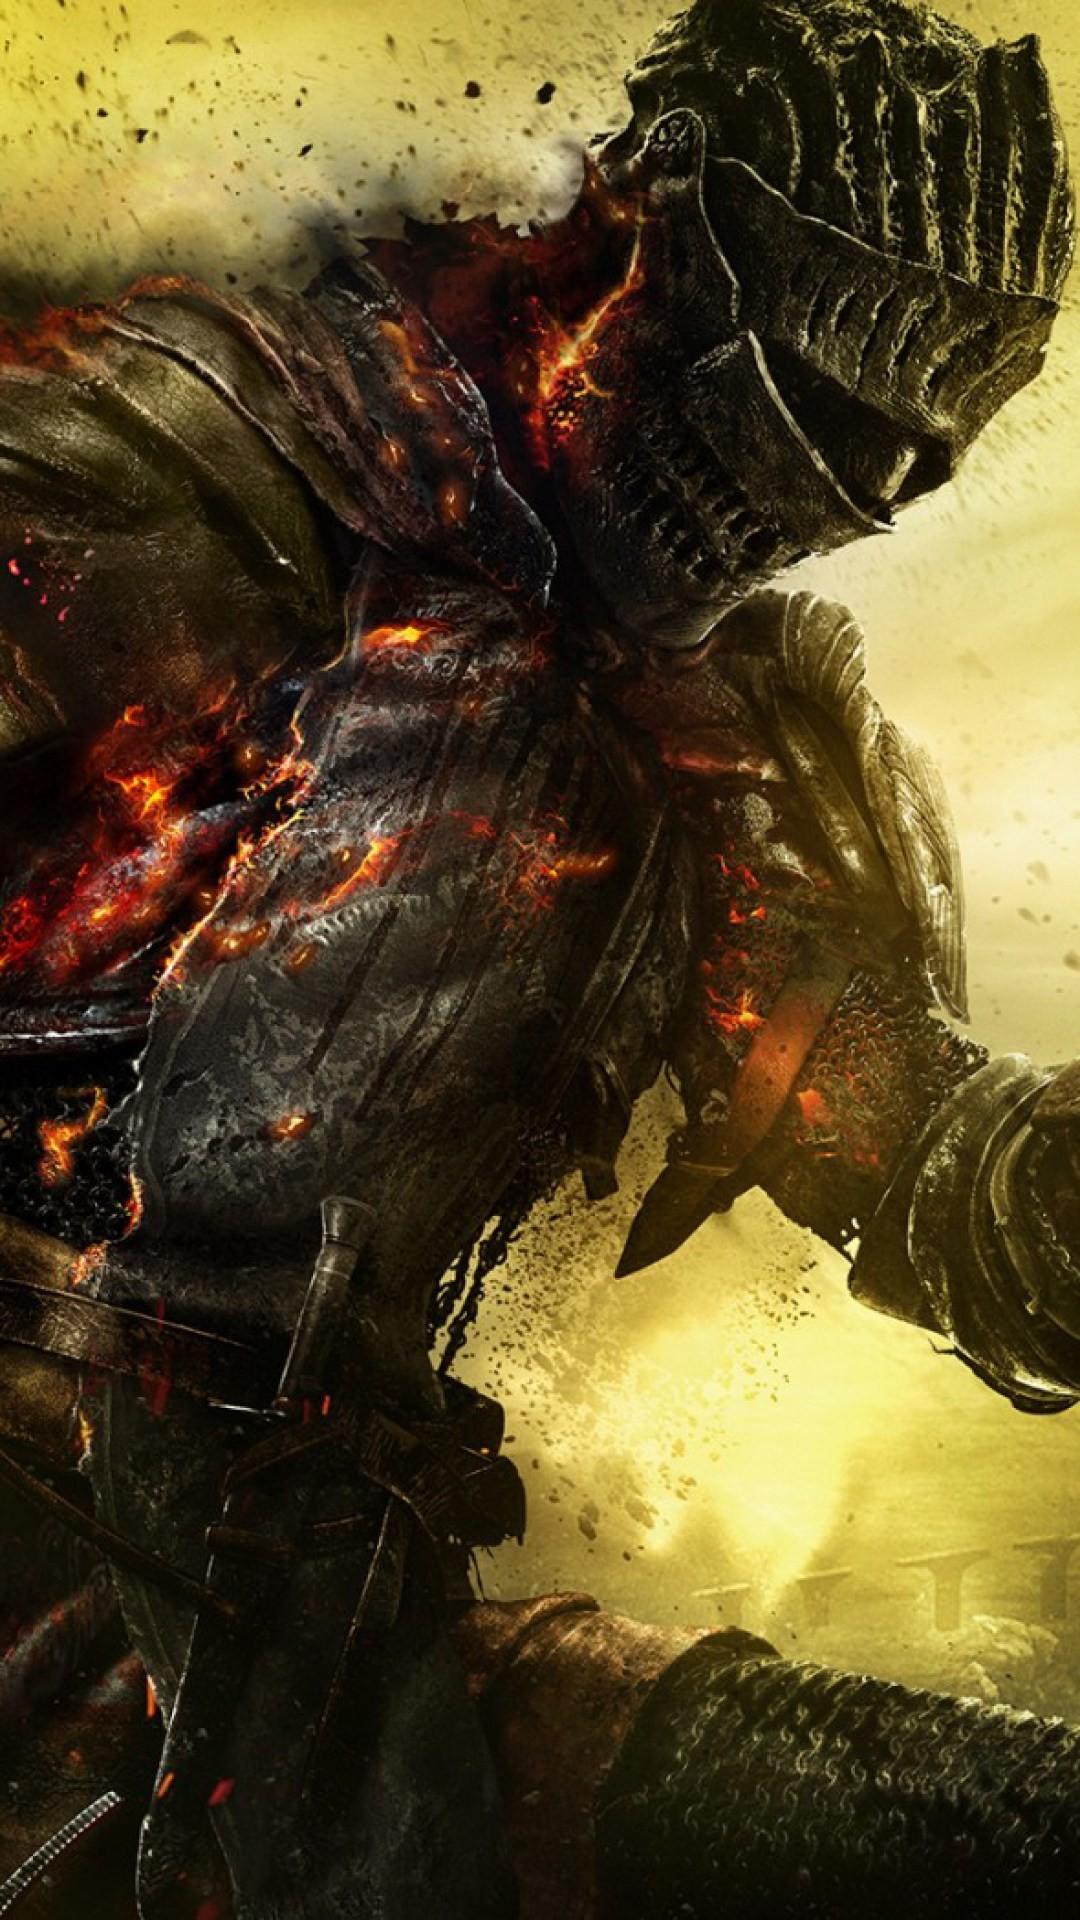 Hd Background Dark Souls Iii Armor Burning Fire Ash Art Wallpaper